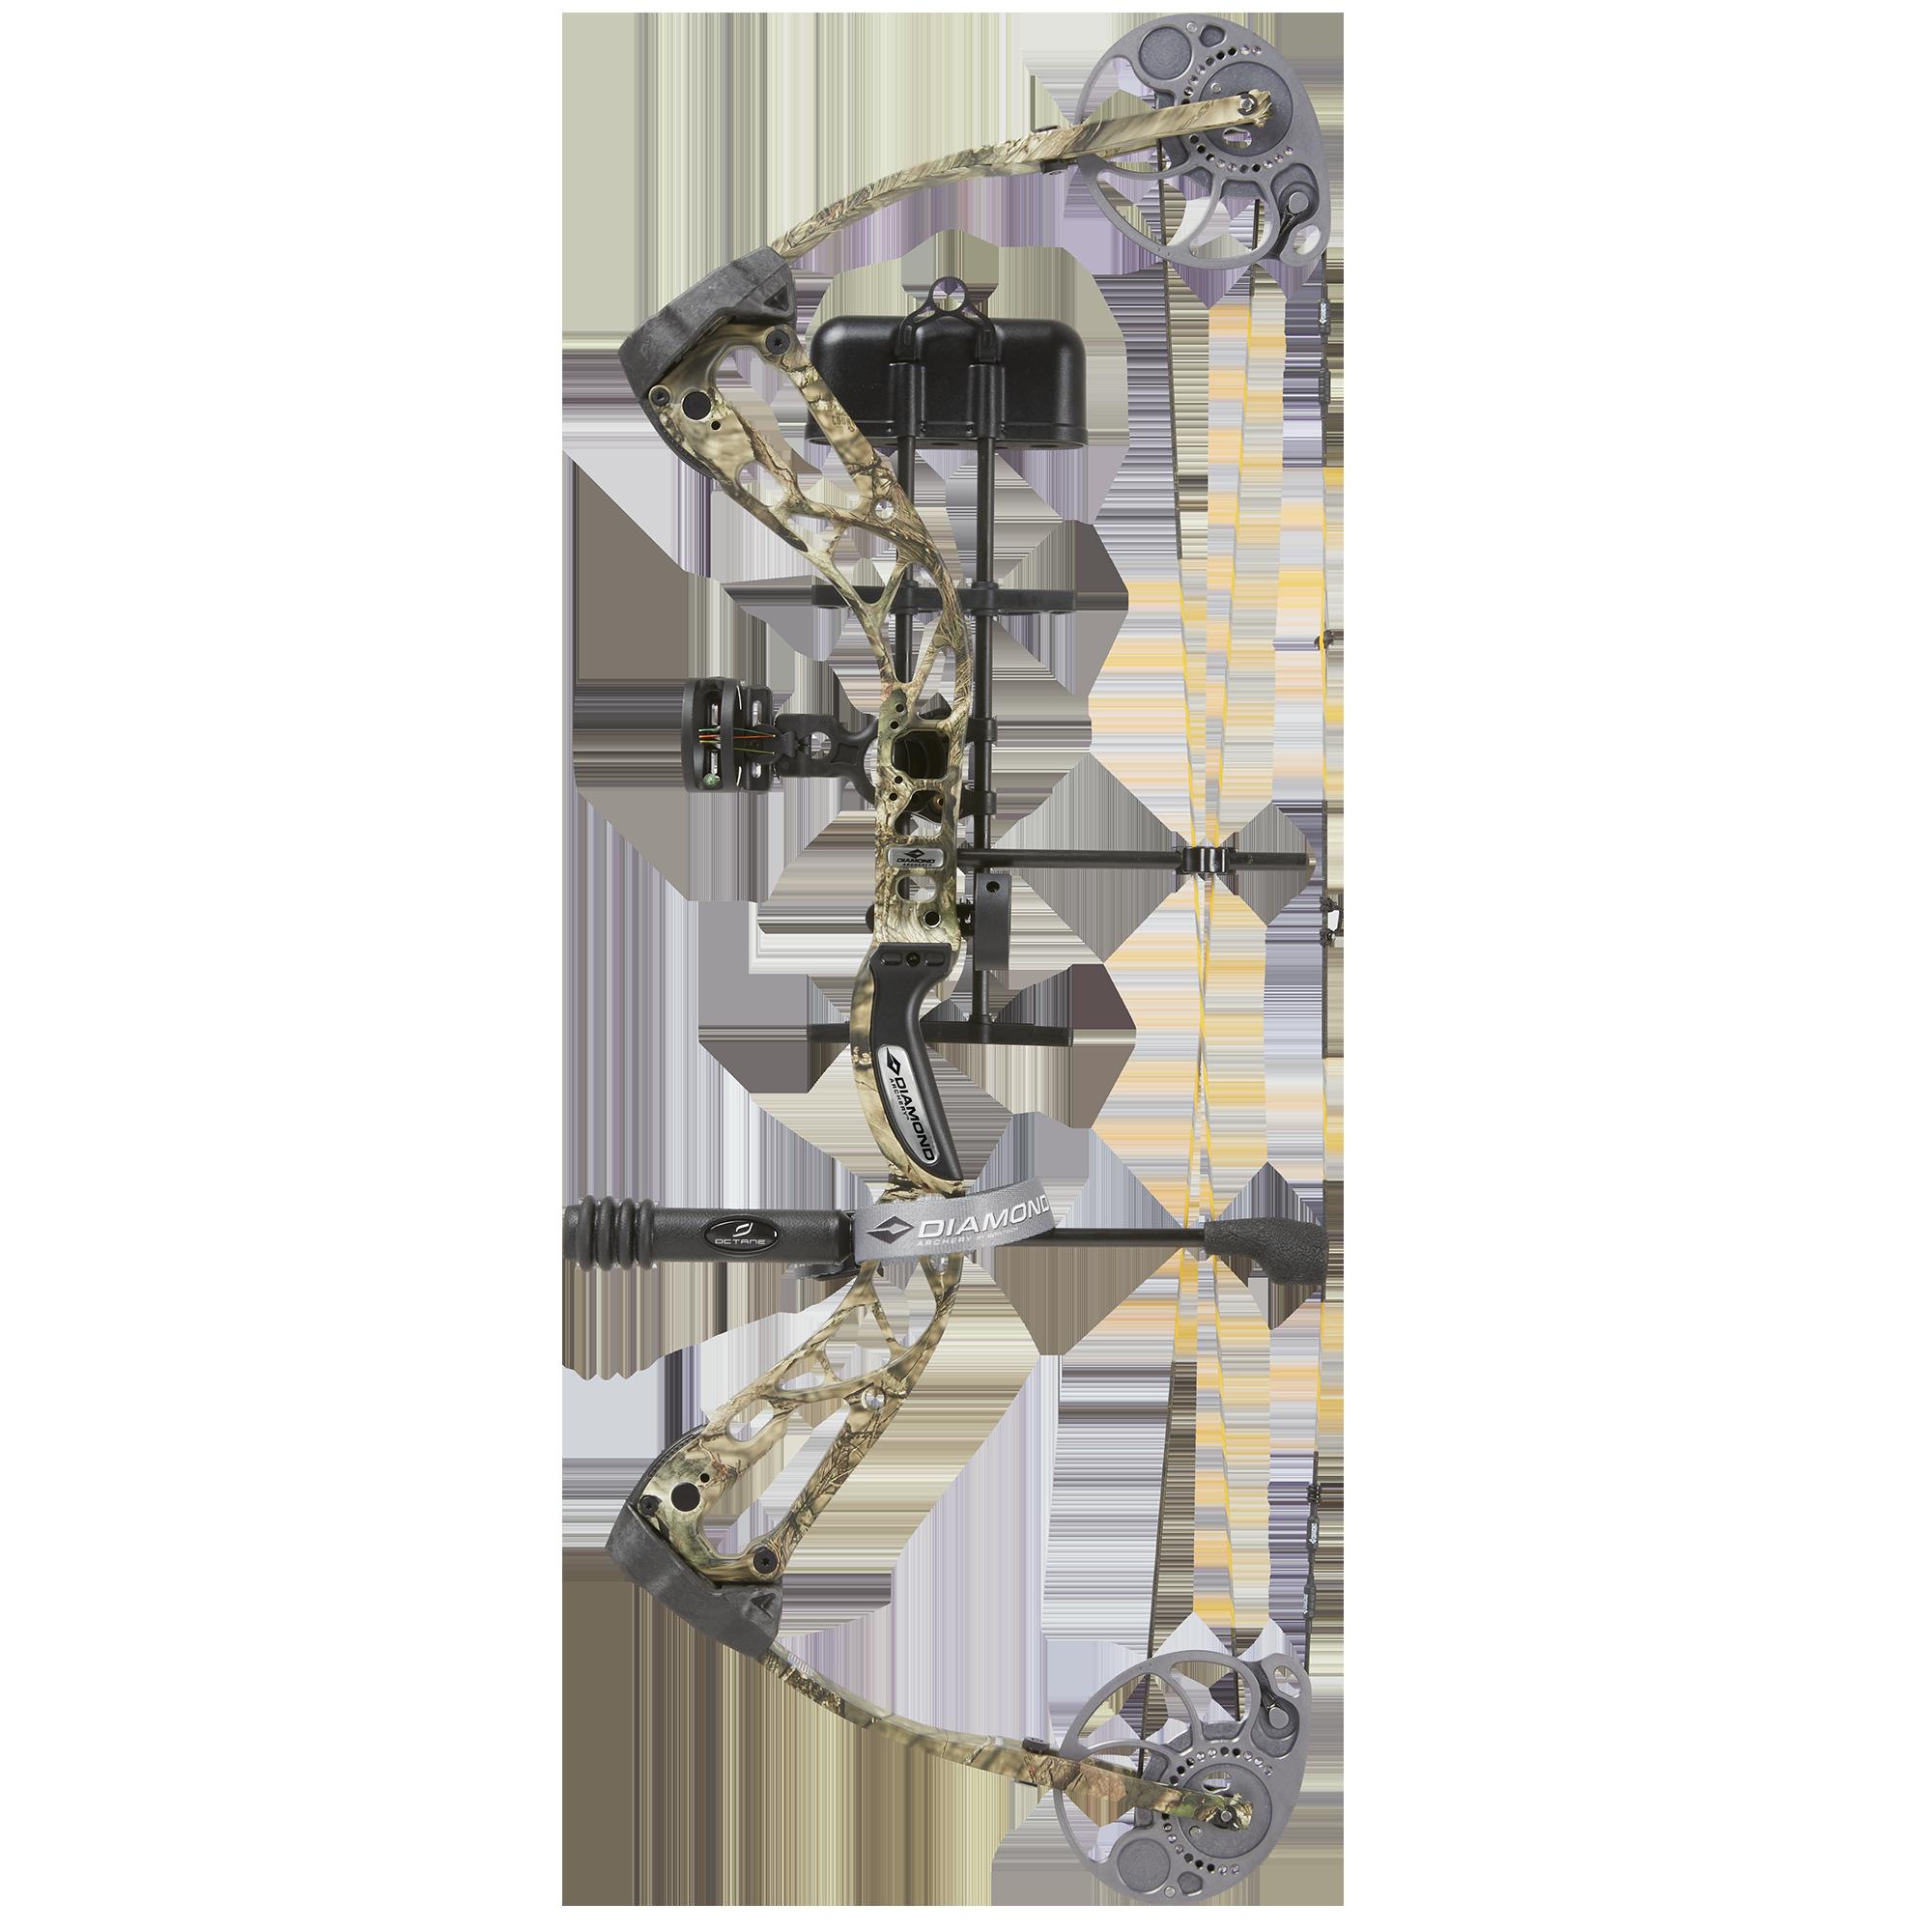 Diamond Archery by BowTech Edge SB-1 Compound Bow Package, RH, Camo